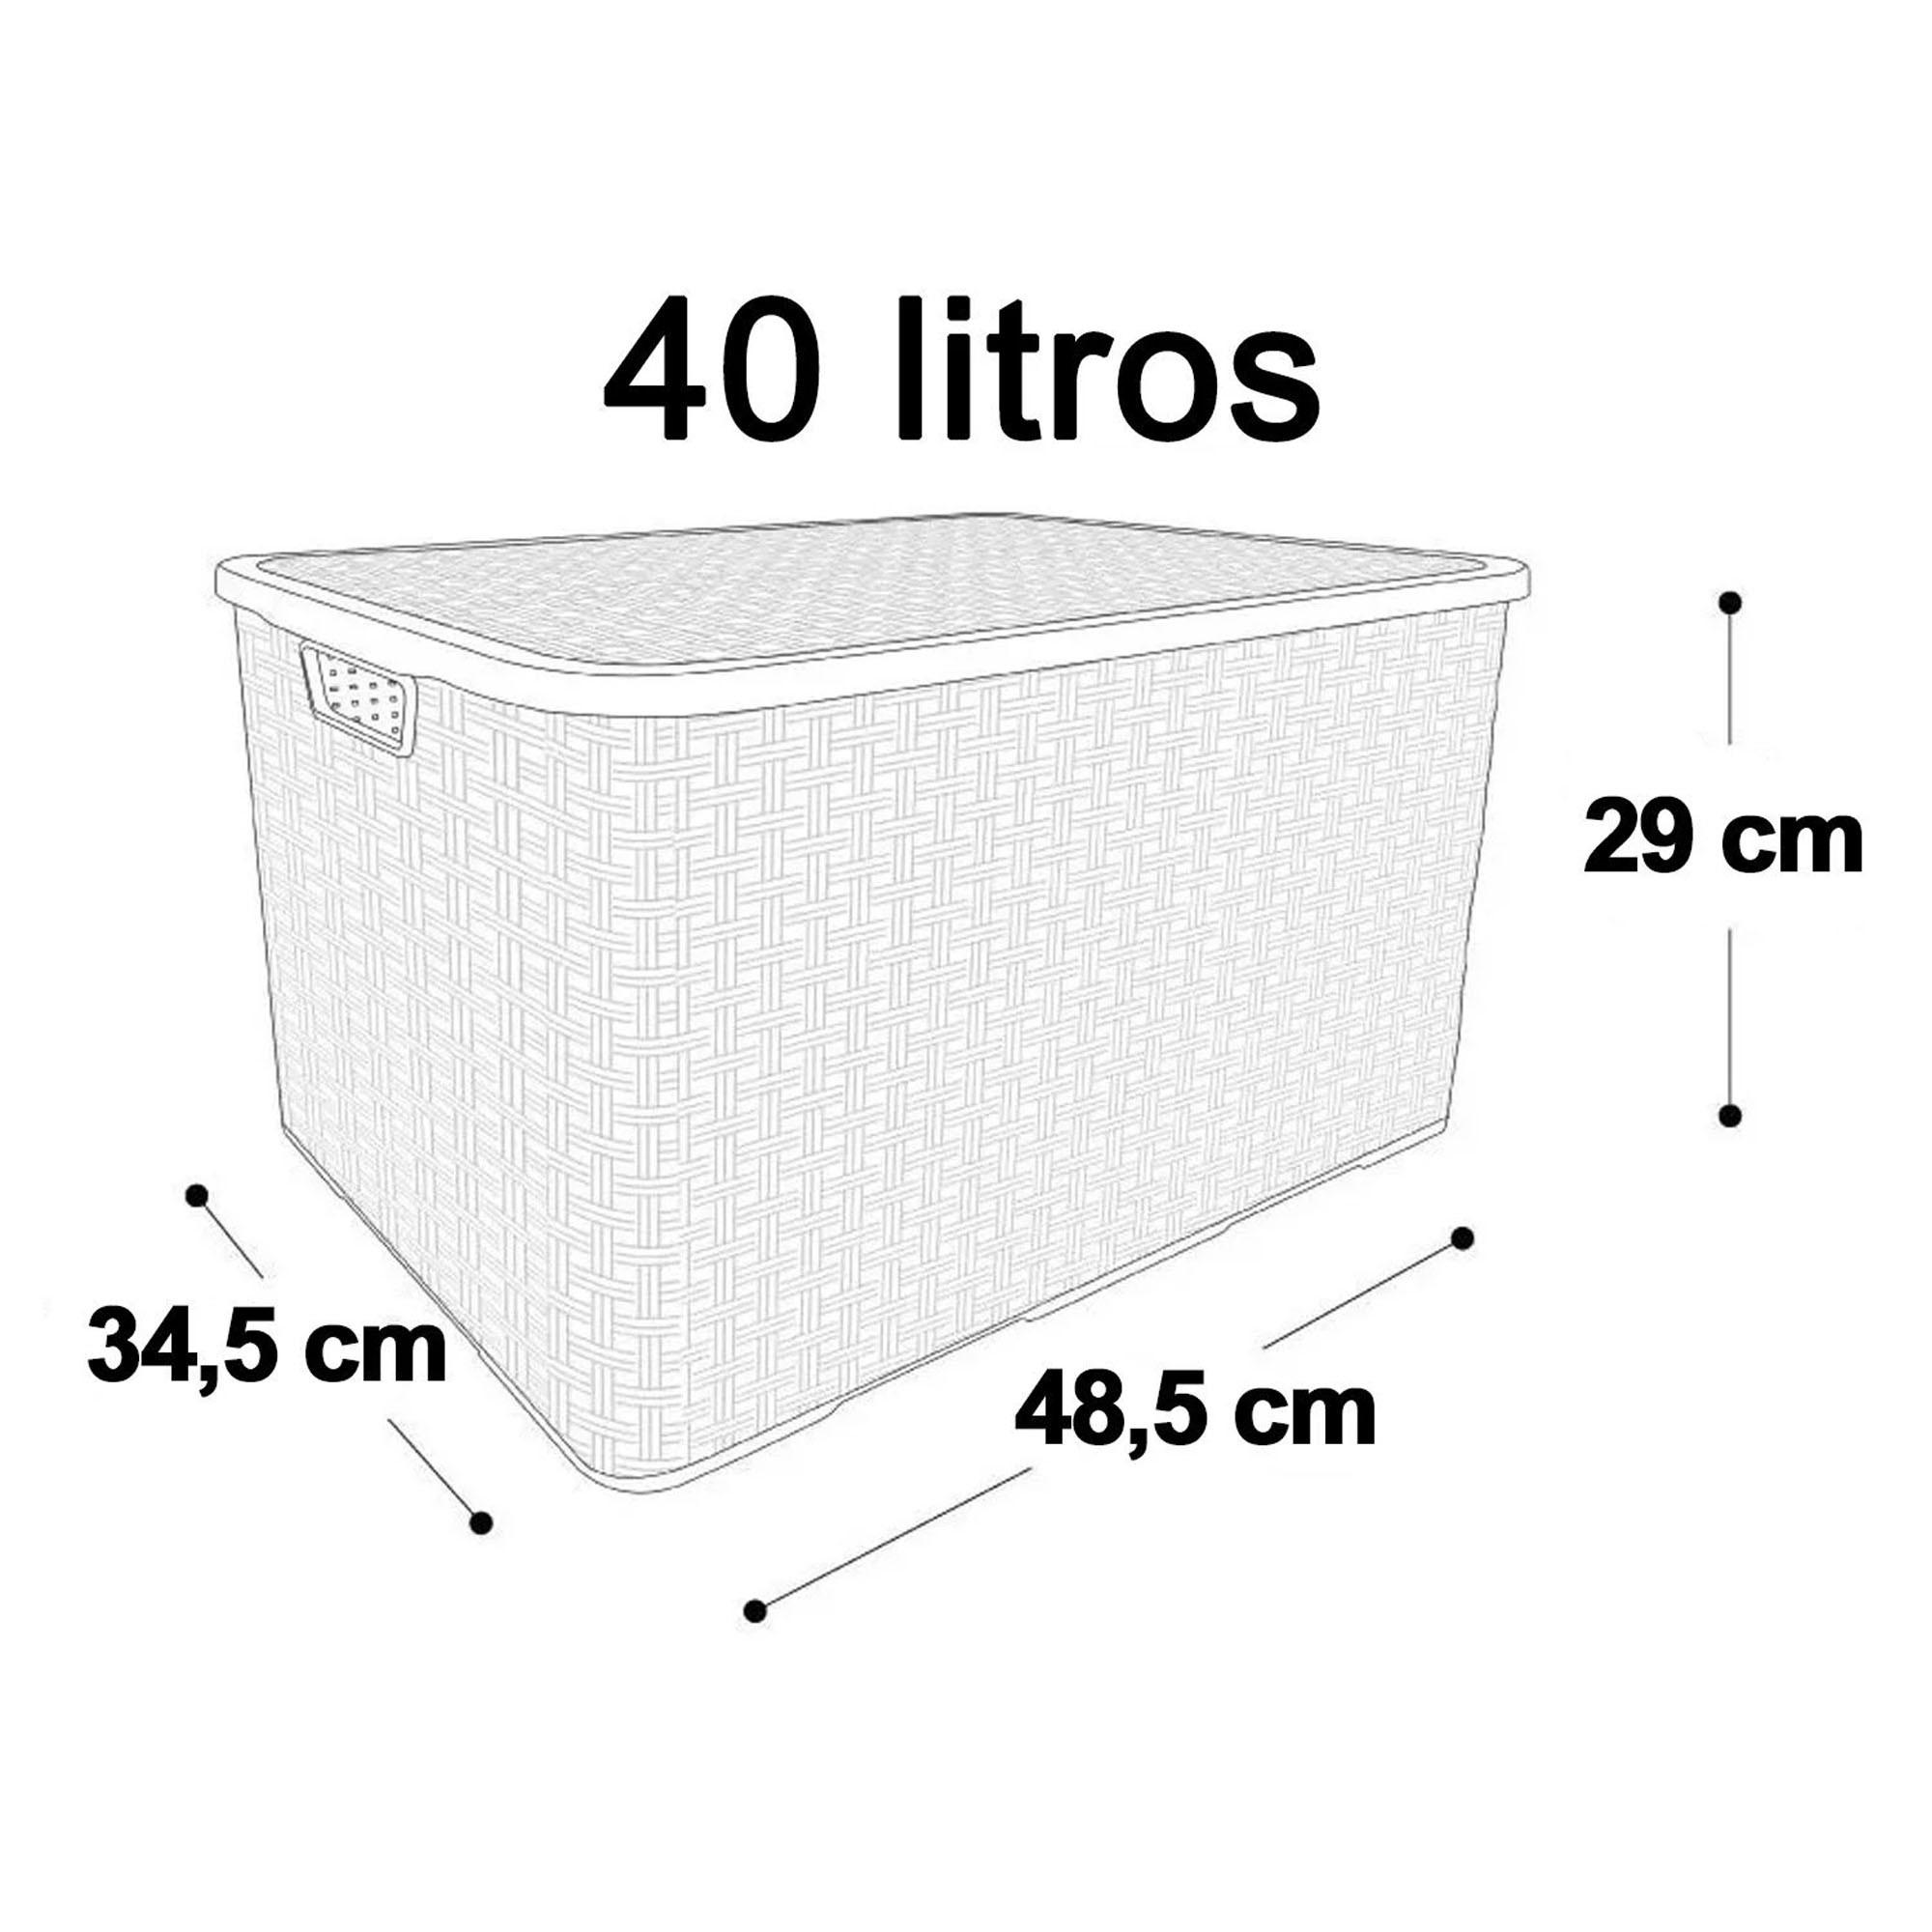 6 x Caixa Organizadora Plástica Cesto Rattan 40 L Com Tampa